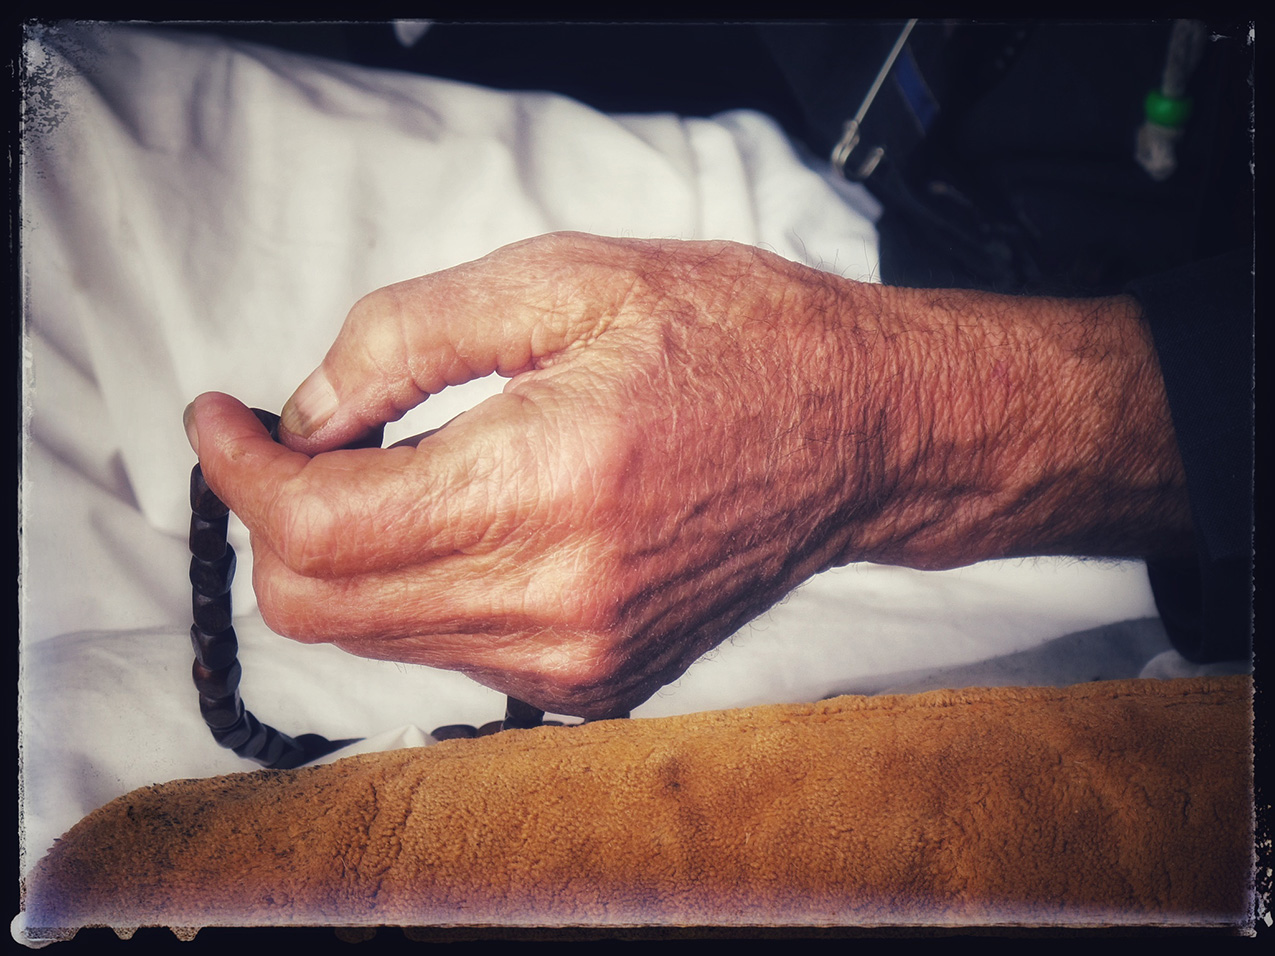 an elderly hand holding rosary beads